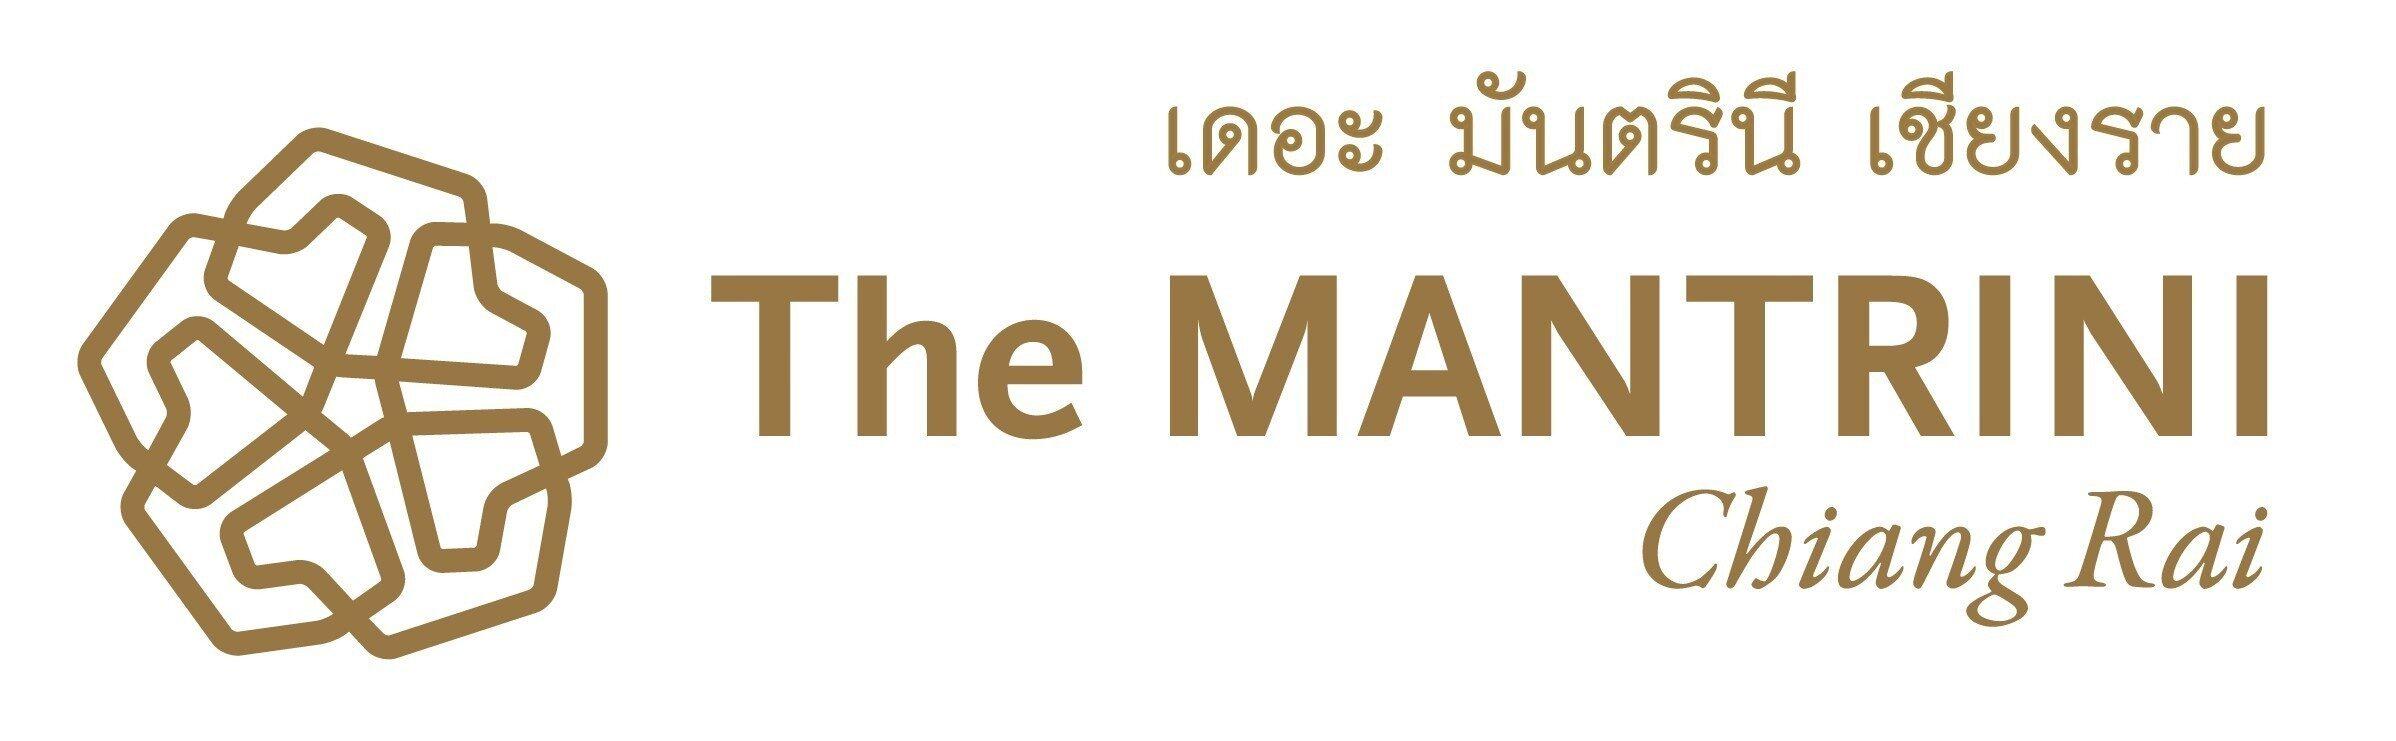 THE MANTRINI